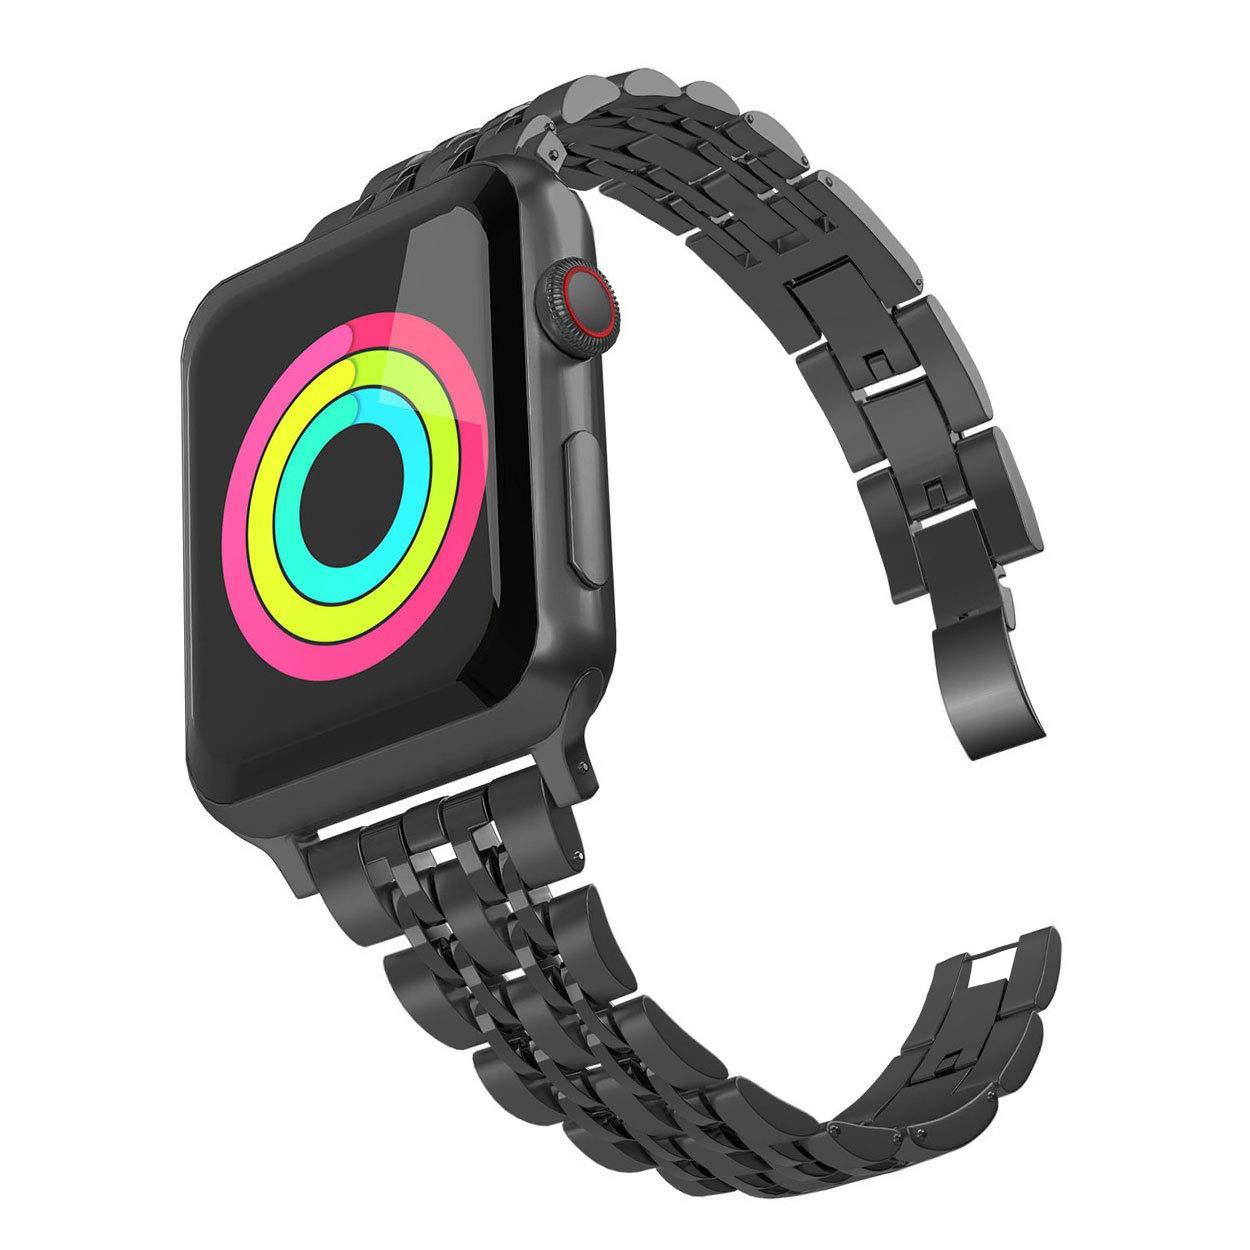 Malla Acero para Apple Watch (42/44mm) AIZILASA [7PP6RZ6C]